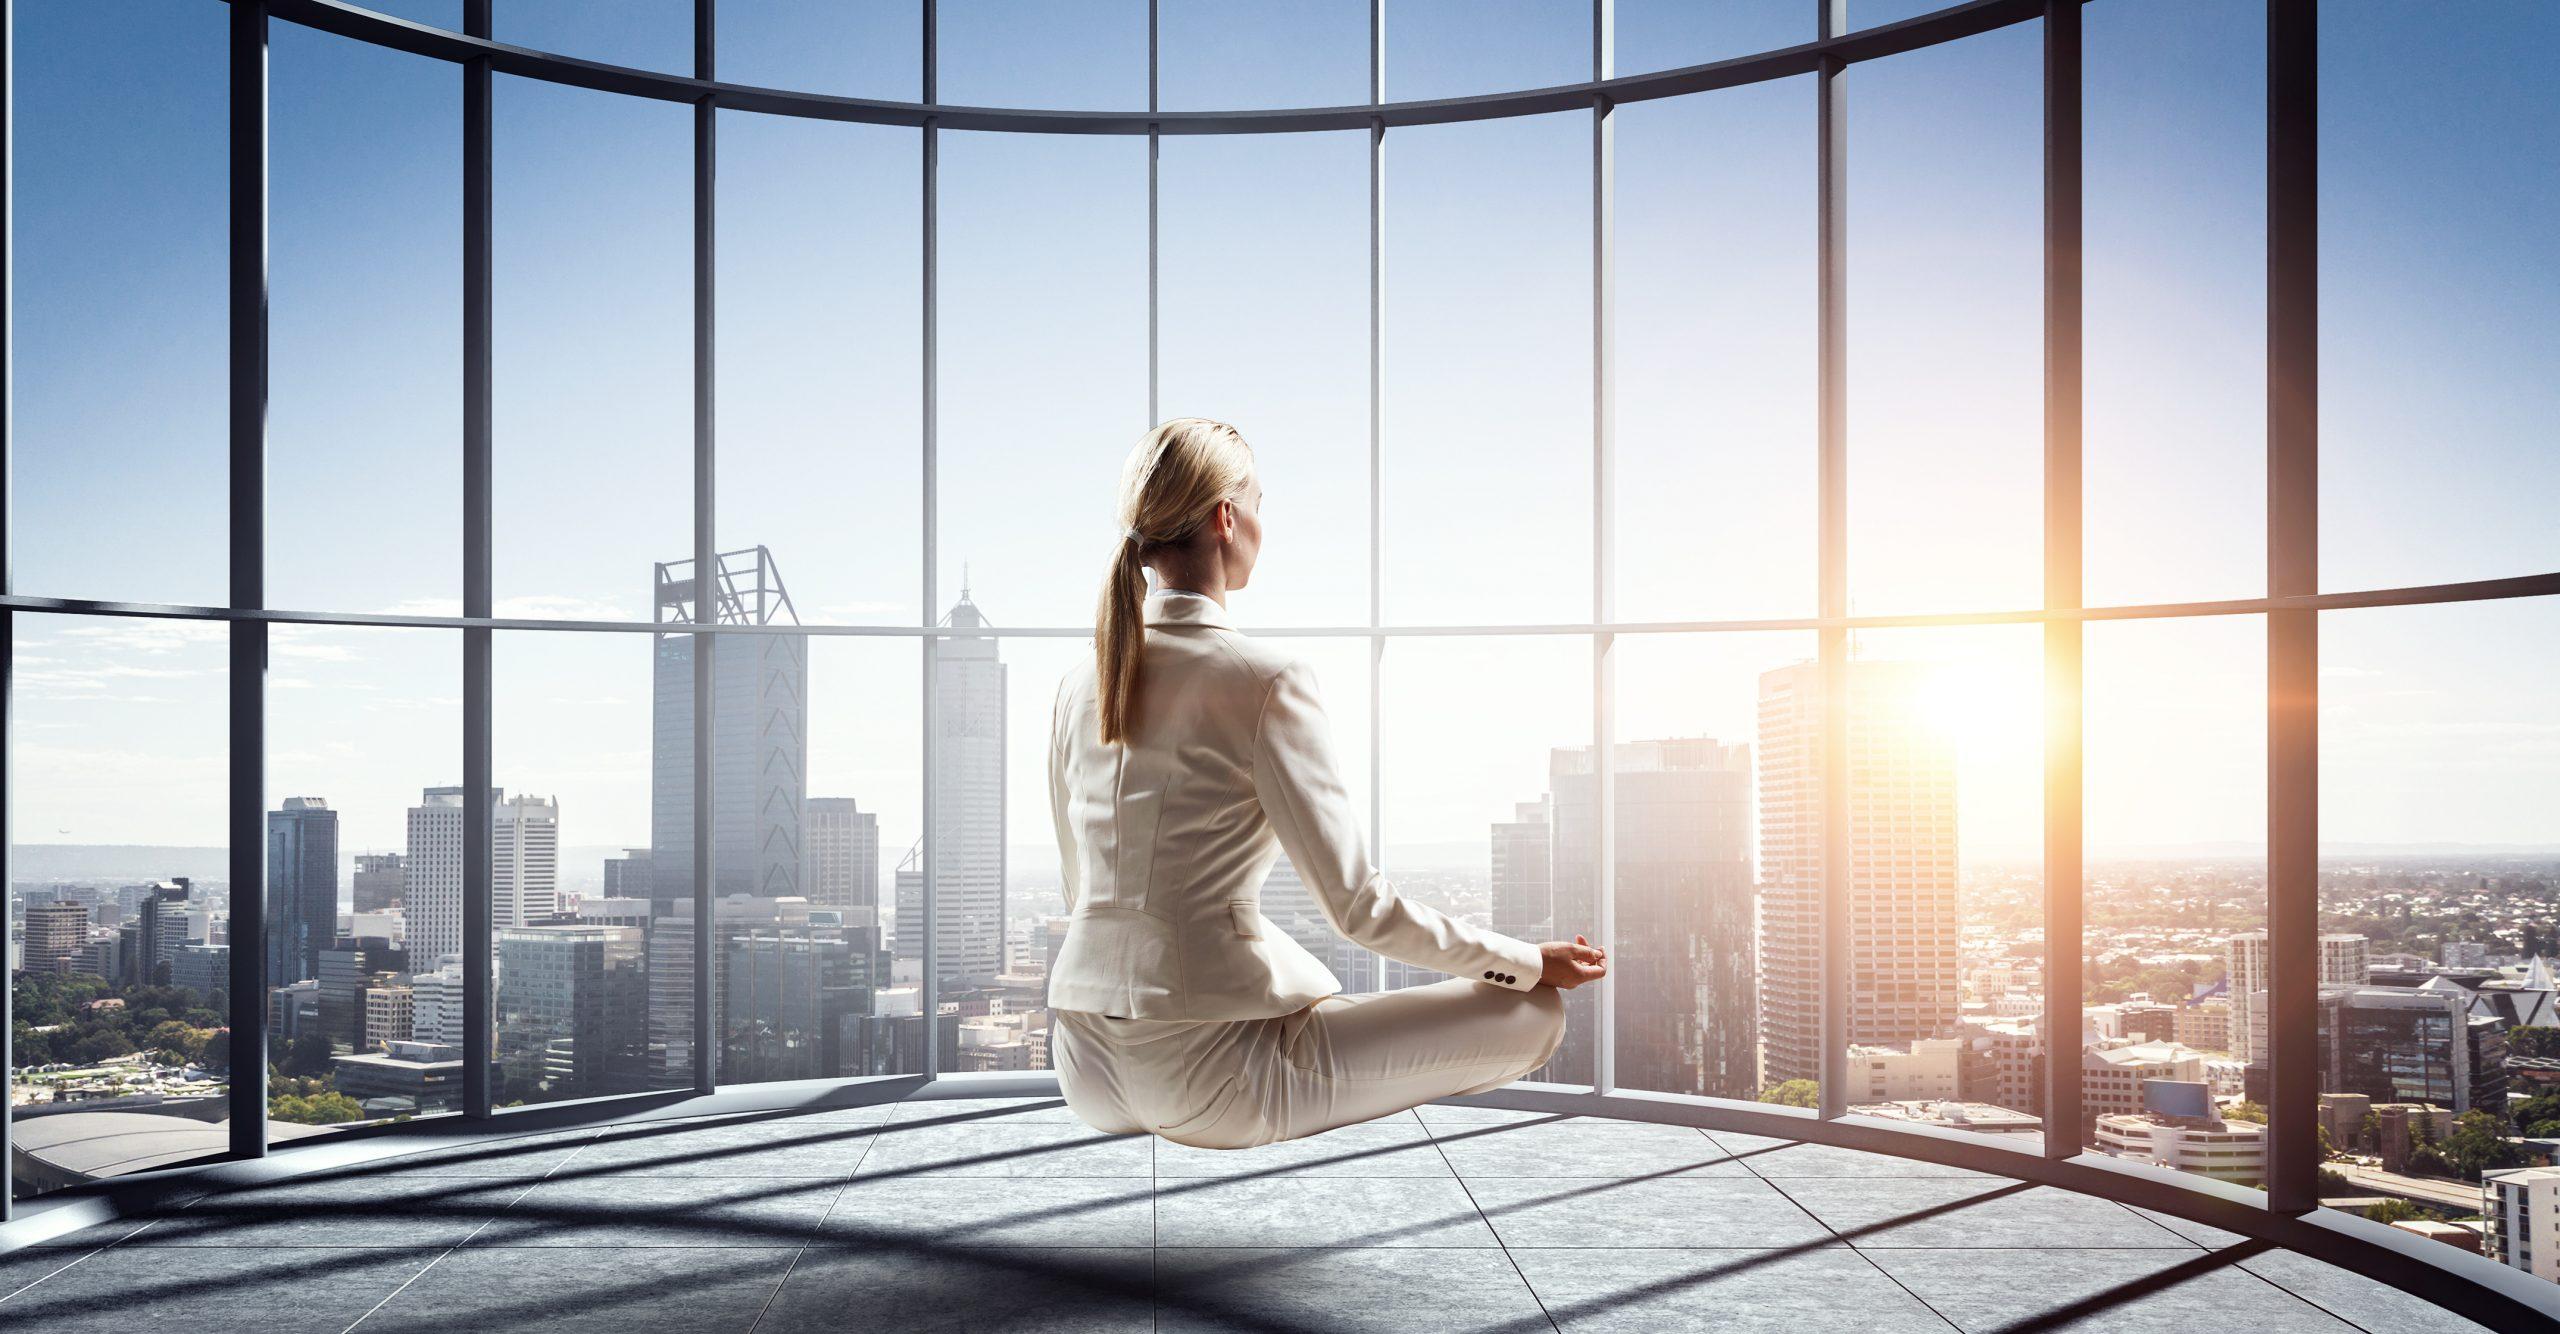 Elegant businesswoman meditating in modern office. Mixed media